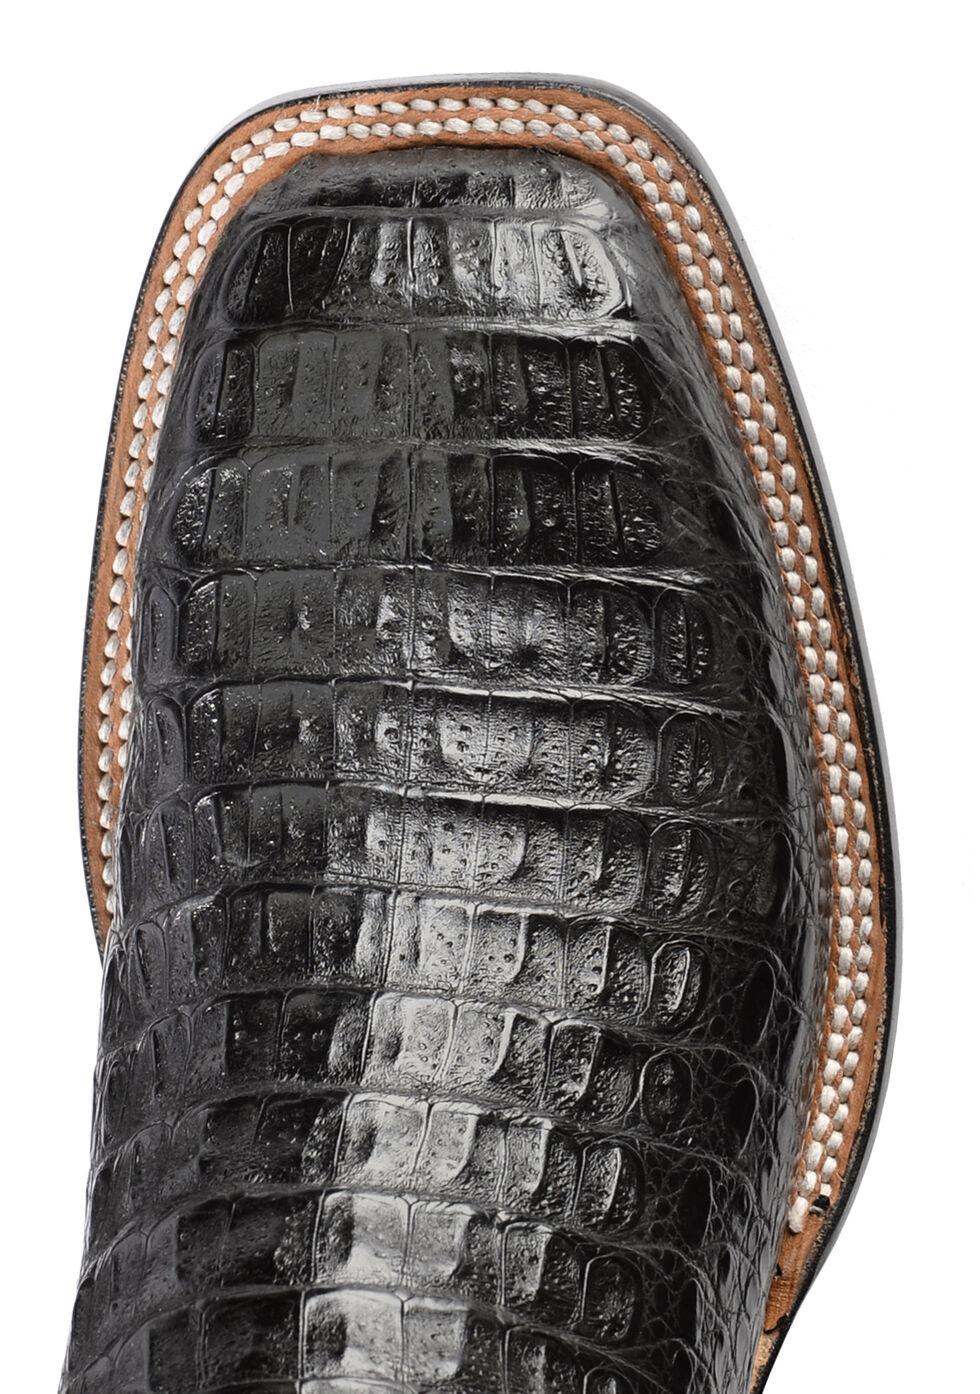 Lucchese Handmade 1883 Men's Rhys Hornback Caiman Cowboy Boots - Square Toe, Black, hi-res